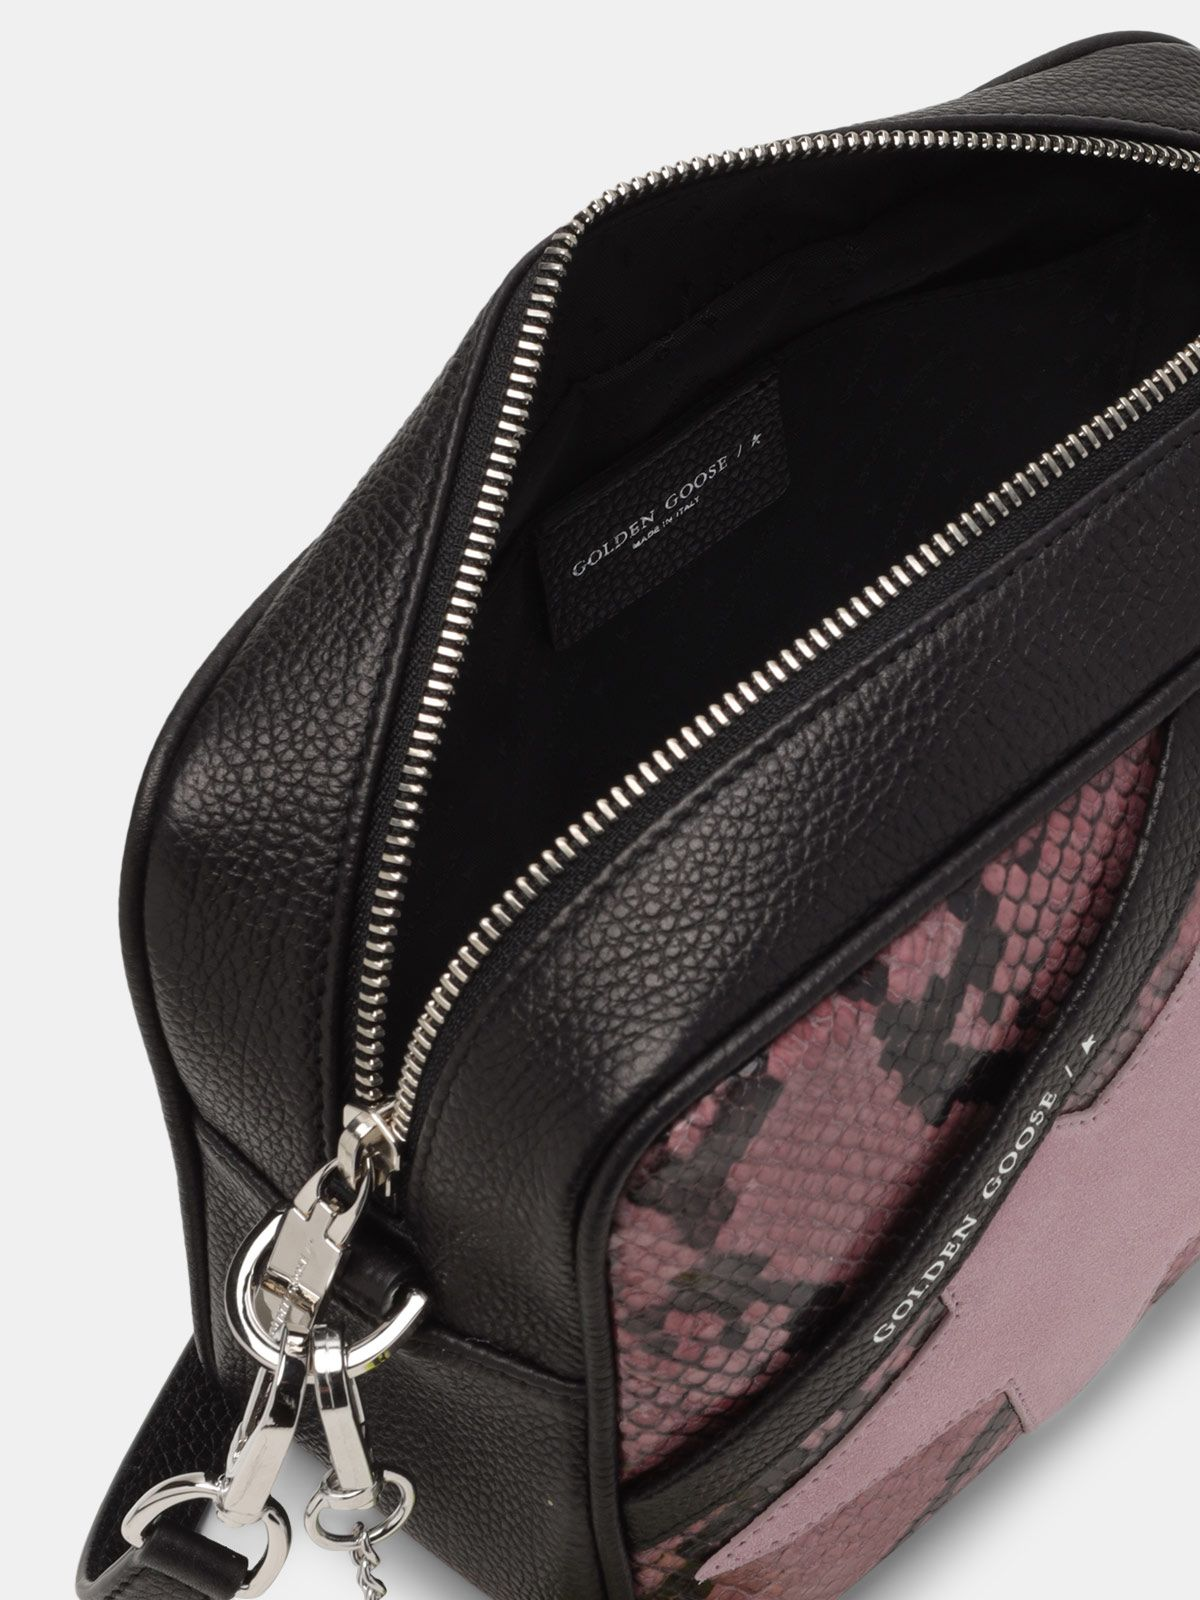 Golden Goose - Borsa Star Bag in pelle pitonata rosa in